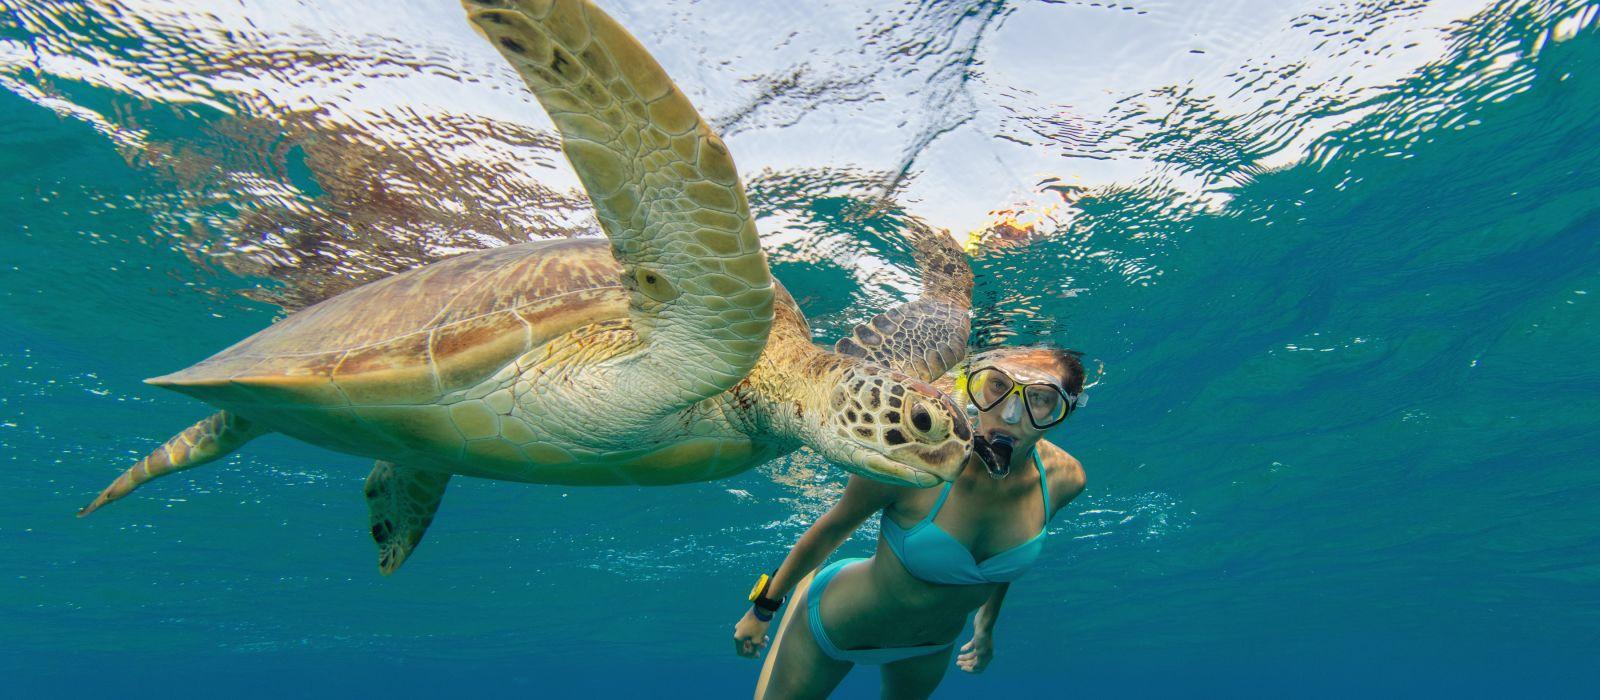 Seychellen: Inselparadies & The Moorings Kreuzfahrt Urlaub 1